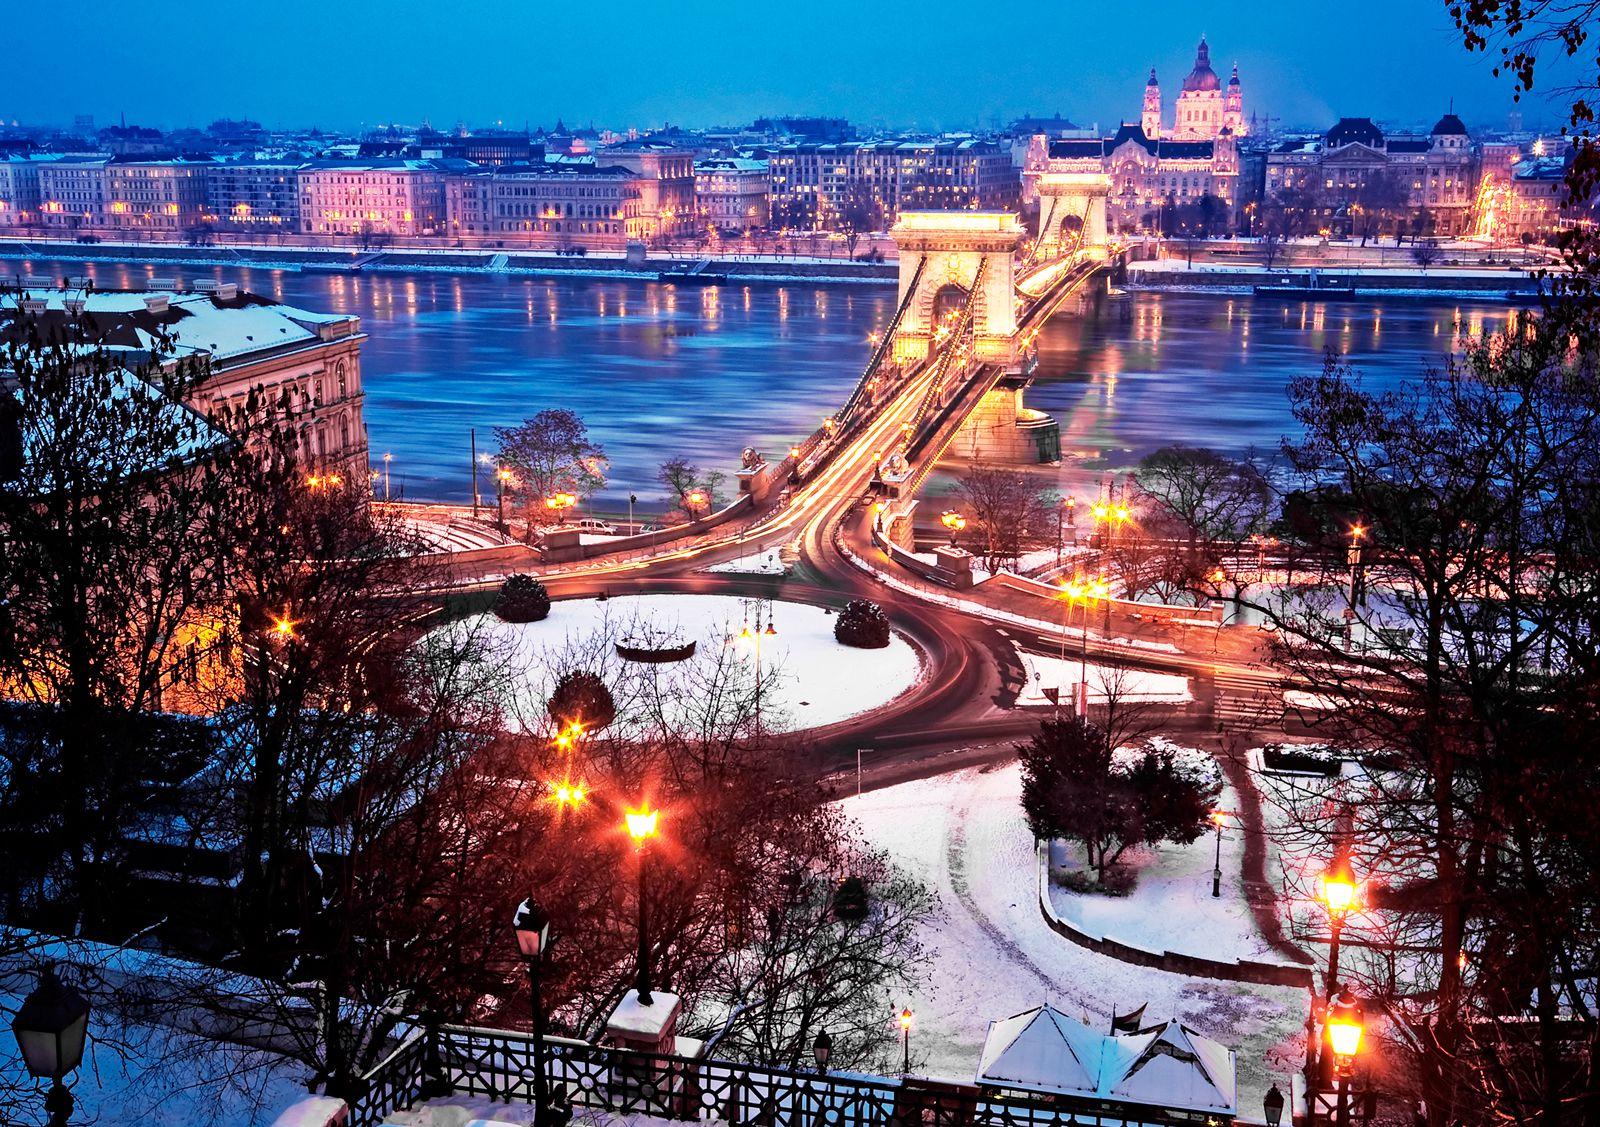 2021/01/Advent-Budimpešta-3.jpg